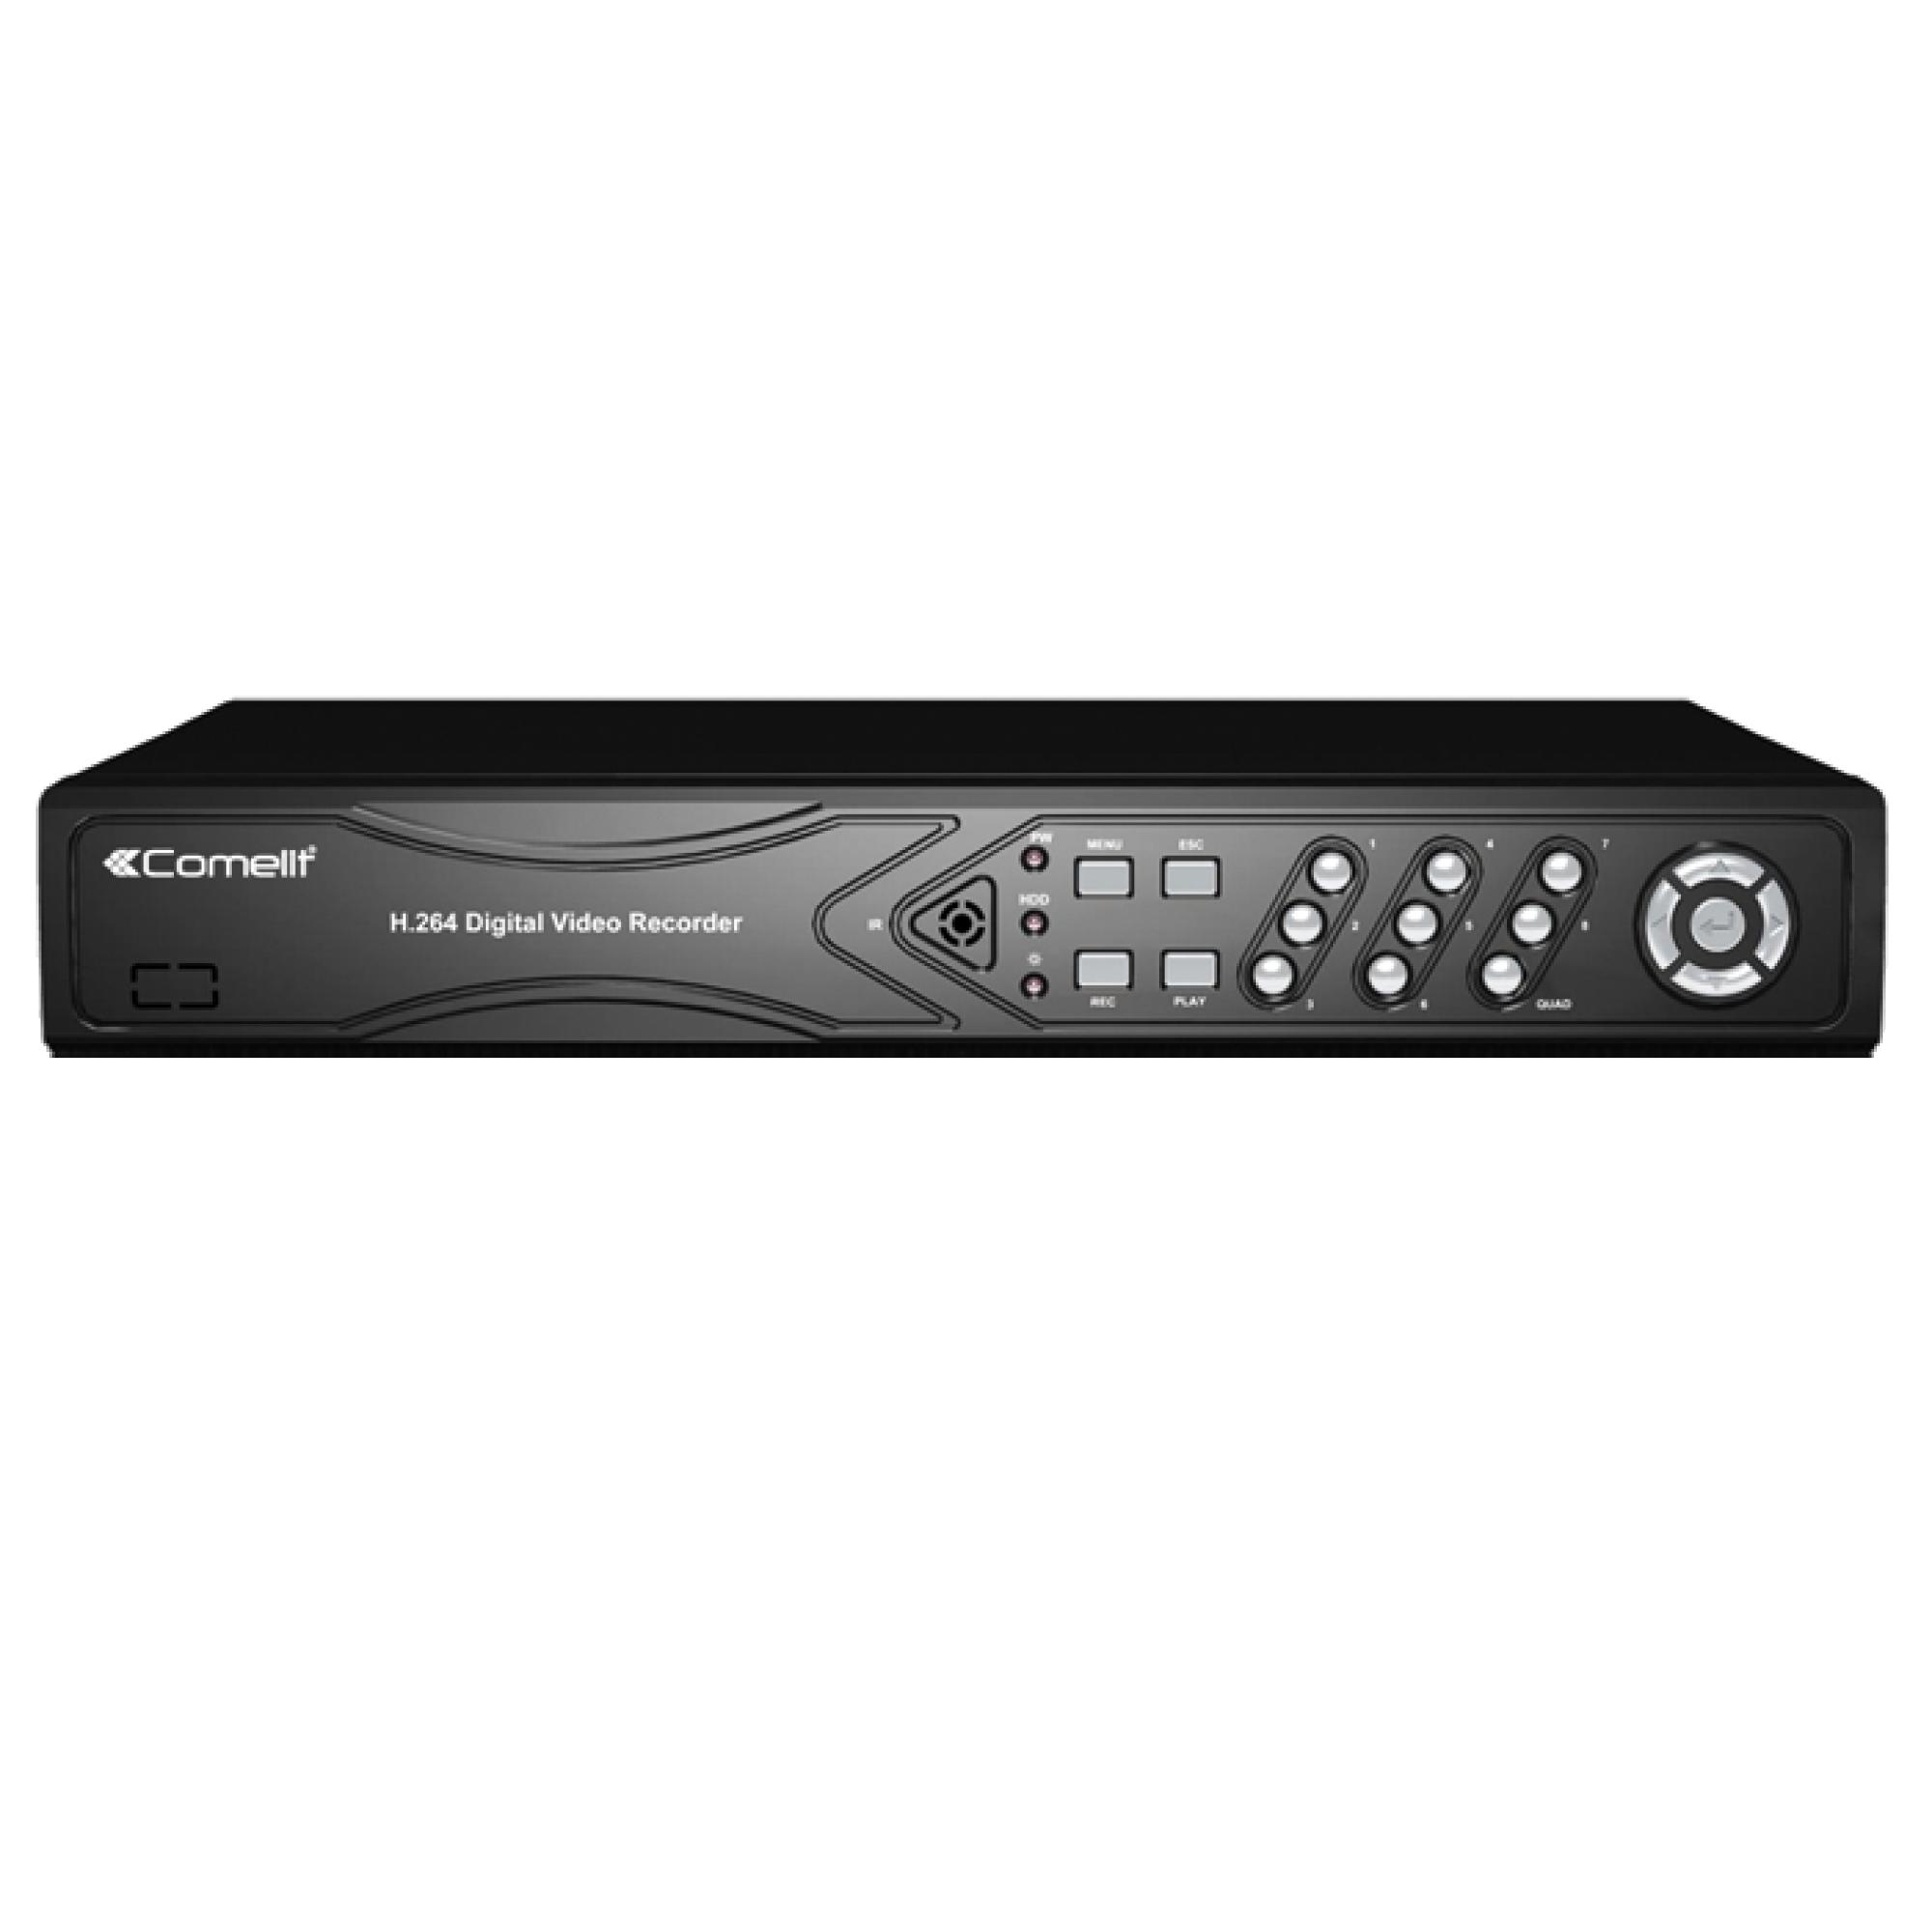 IPNVR006A